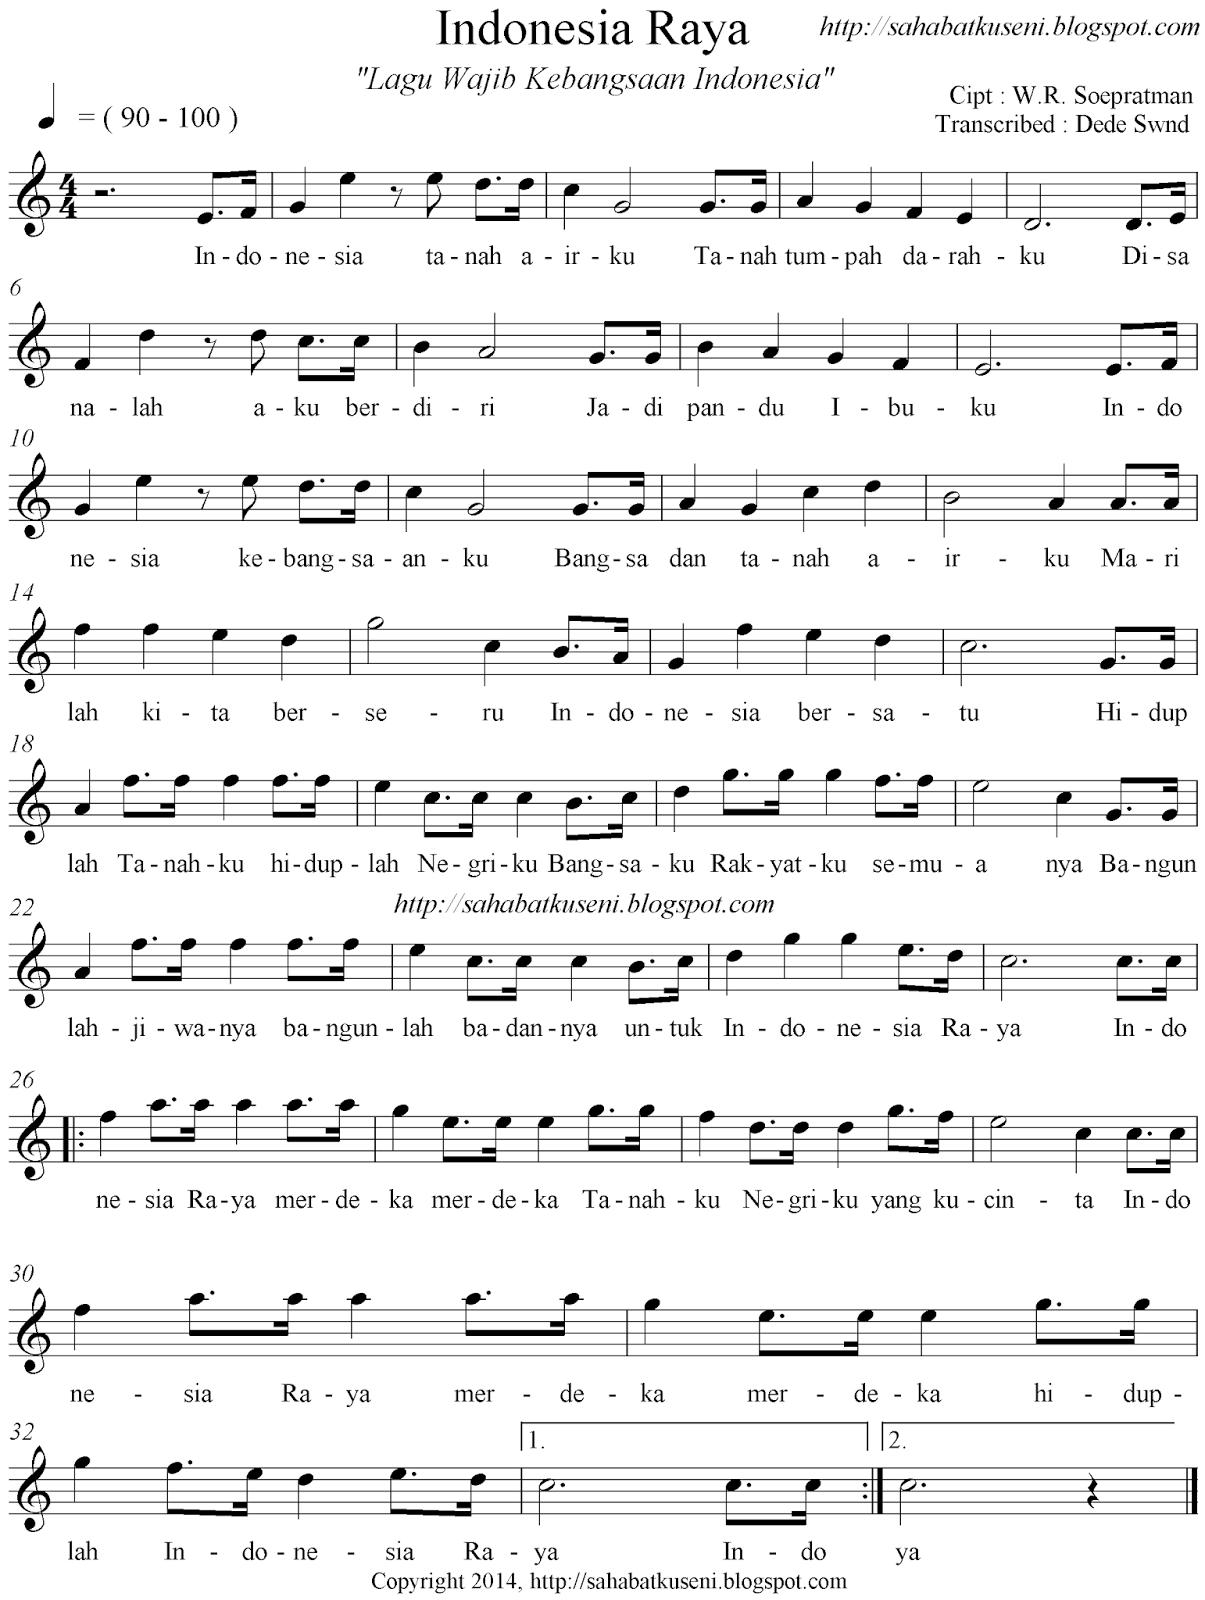 Not Angka Lagu Indonesia Raya : angka, indonesia, Balok, Wajib, Indonesia-Raya,, Soepratman, Sahabatku